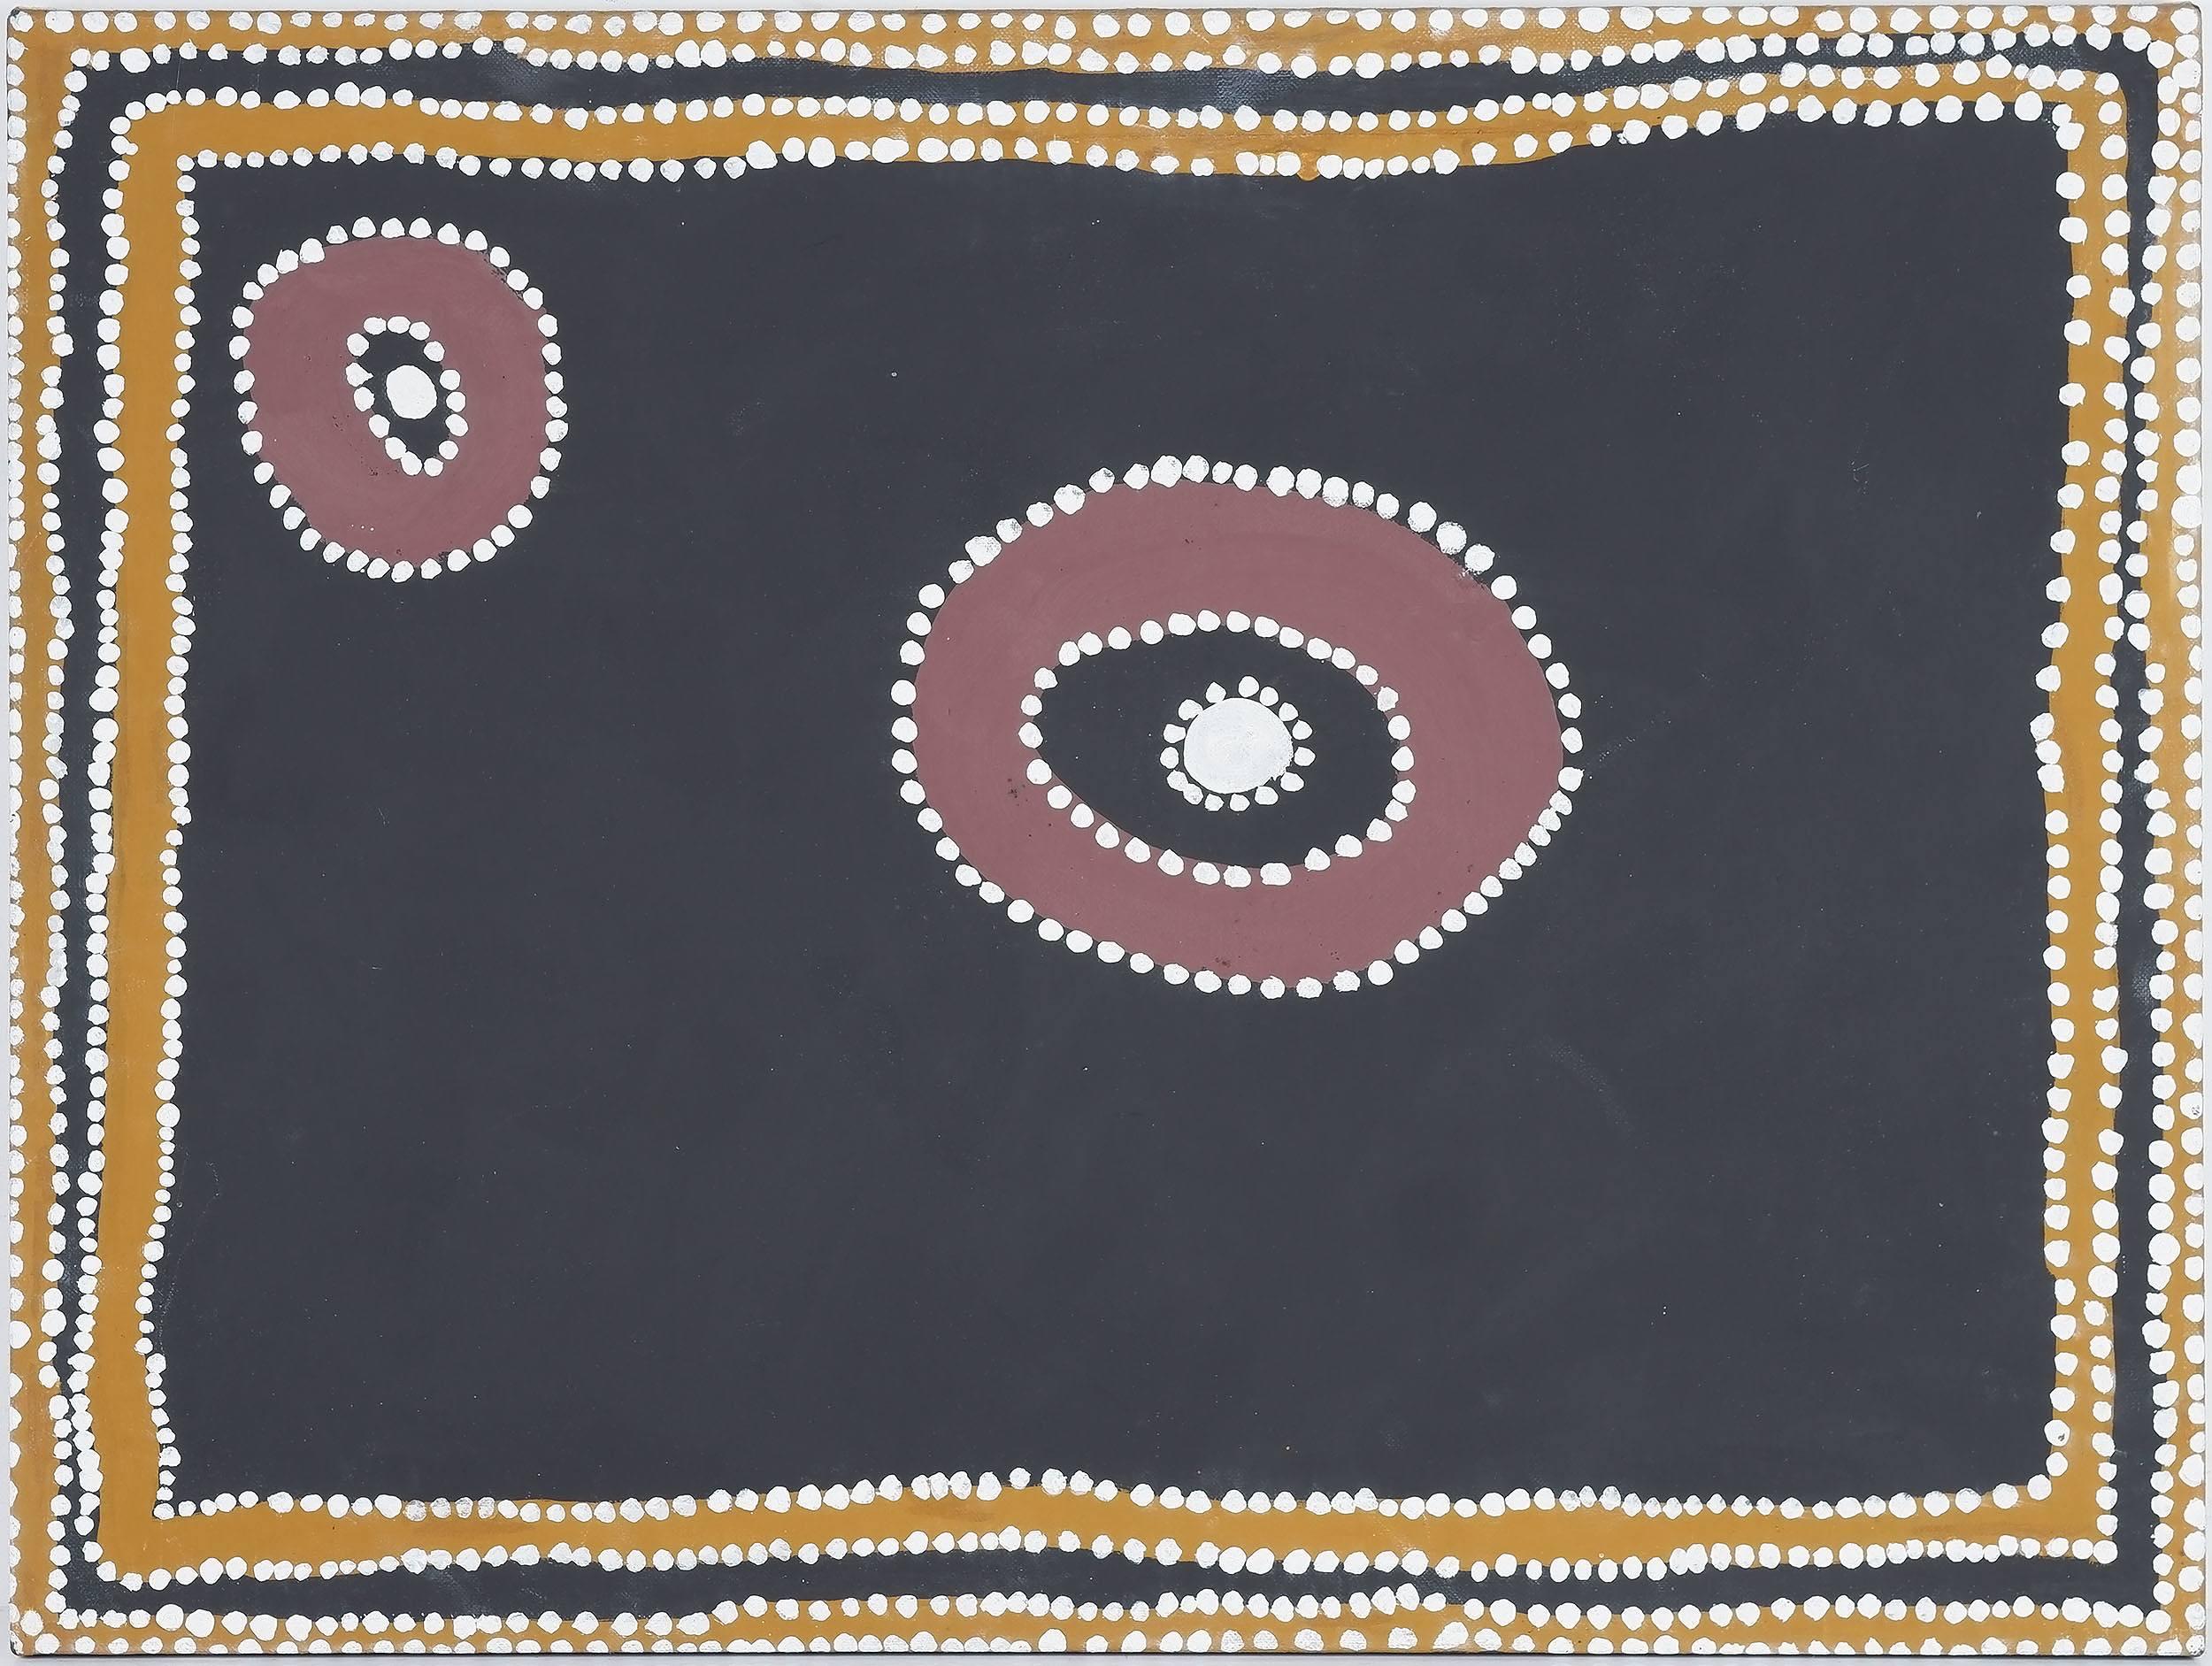 'Rover Thomas (c.1926-1998) Warmun (Turkey Creek) WA 1995, Natural Earth Pigments on Canvas'